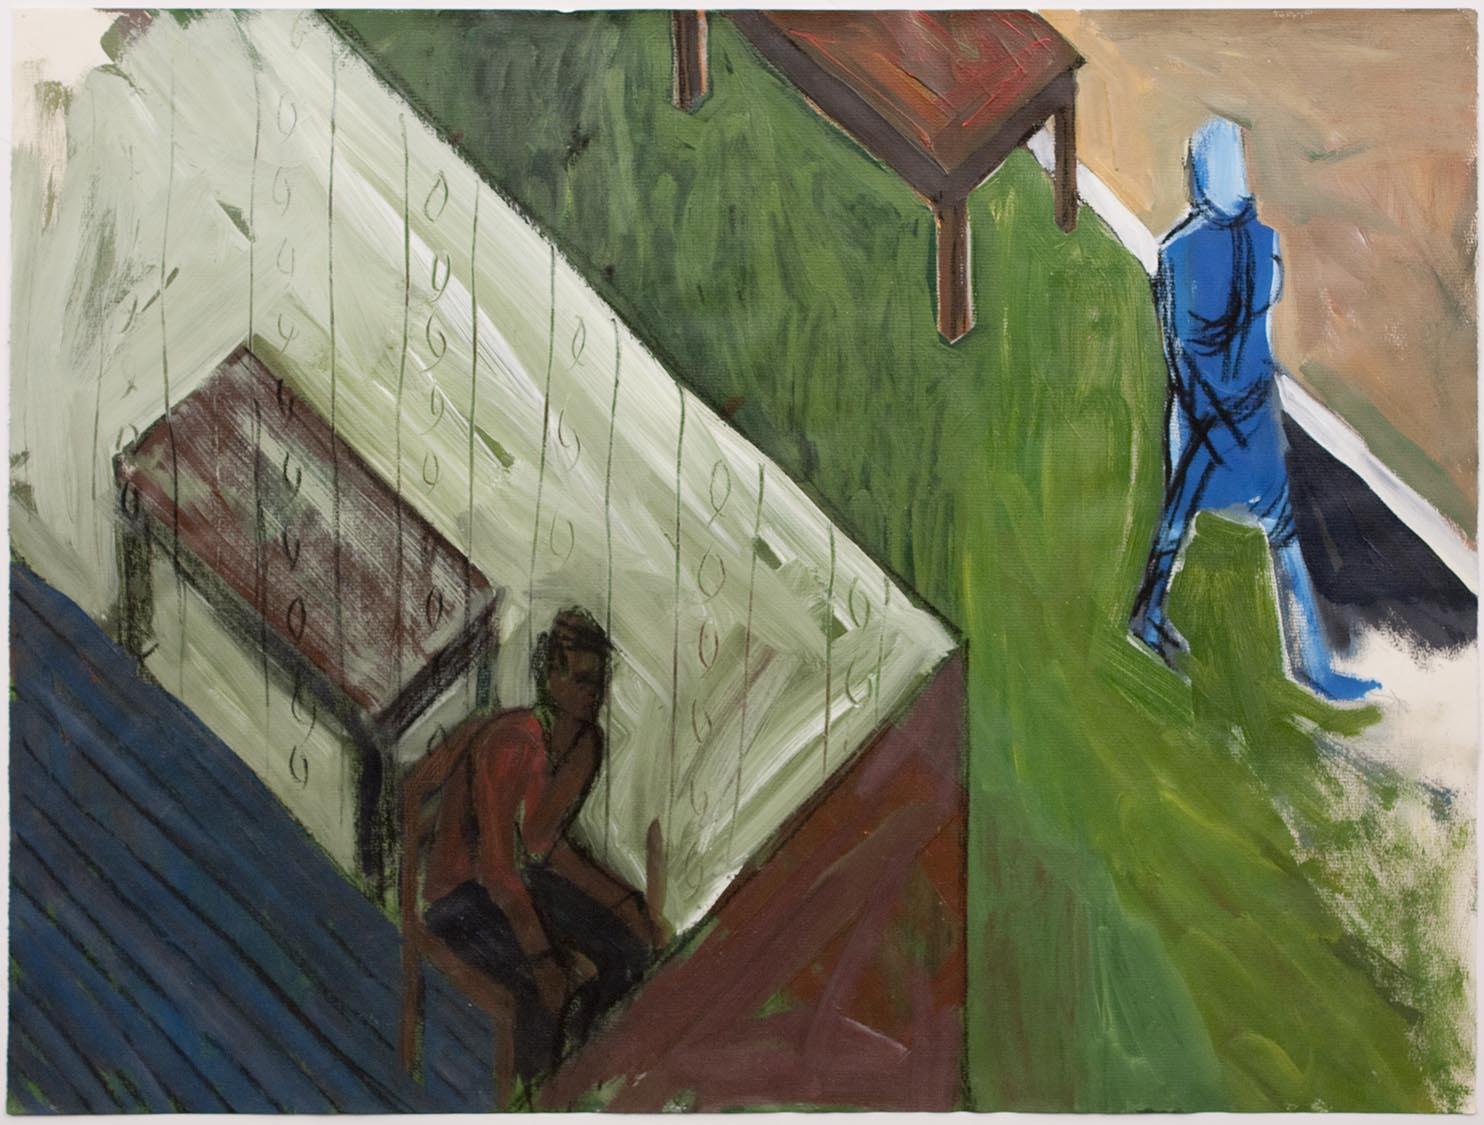 Le voisin écoute (The Neighbour is Listening), 1989